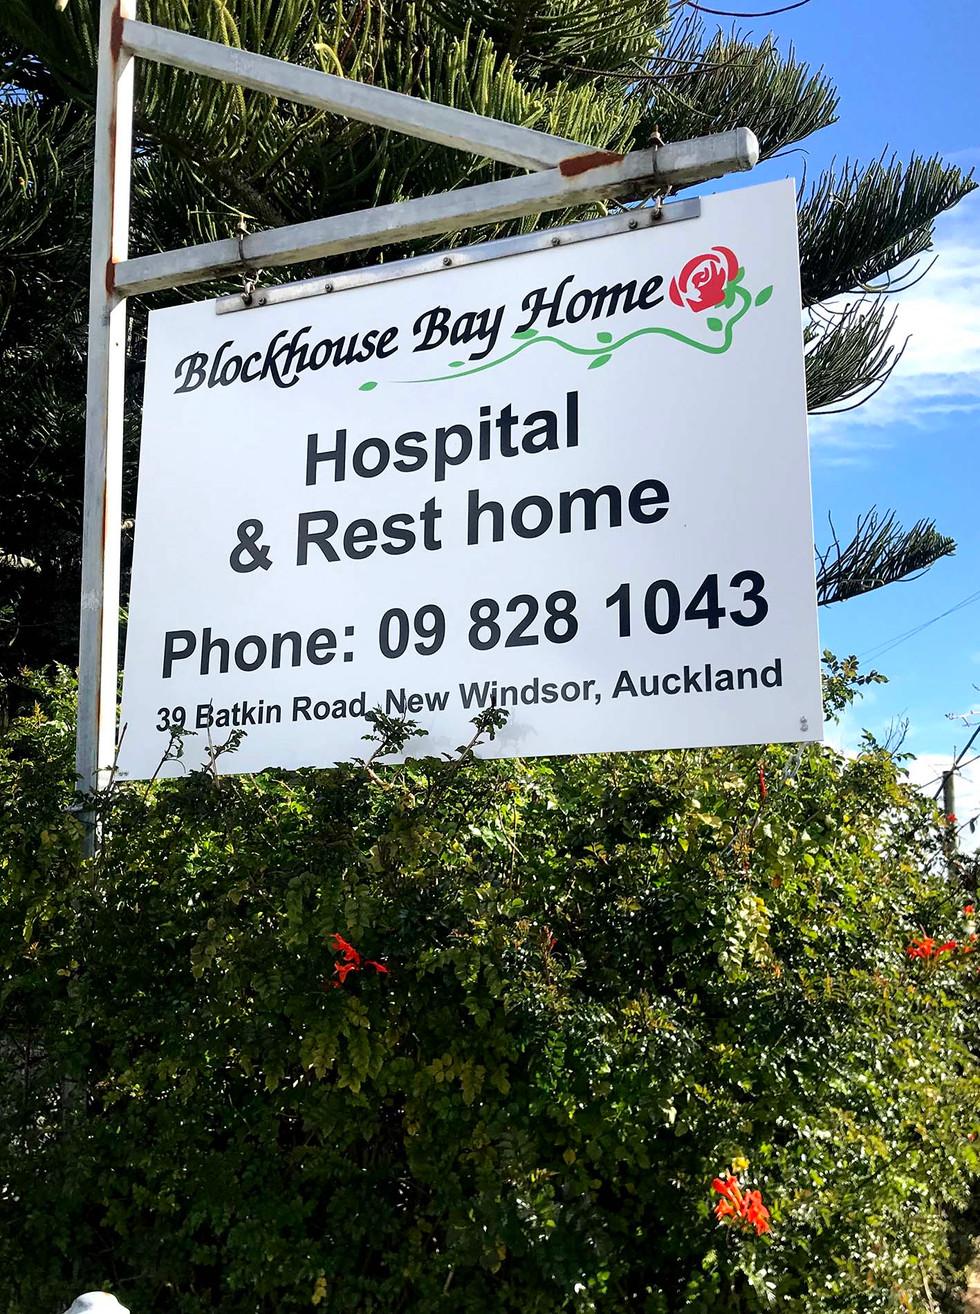 blockhouse bay home hanging sign.jpg